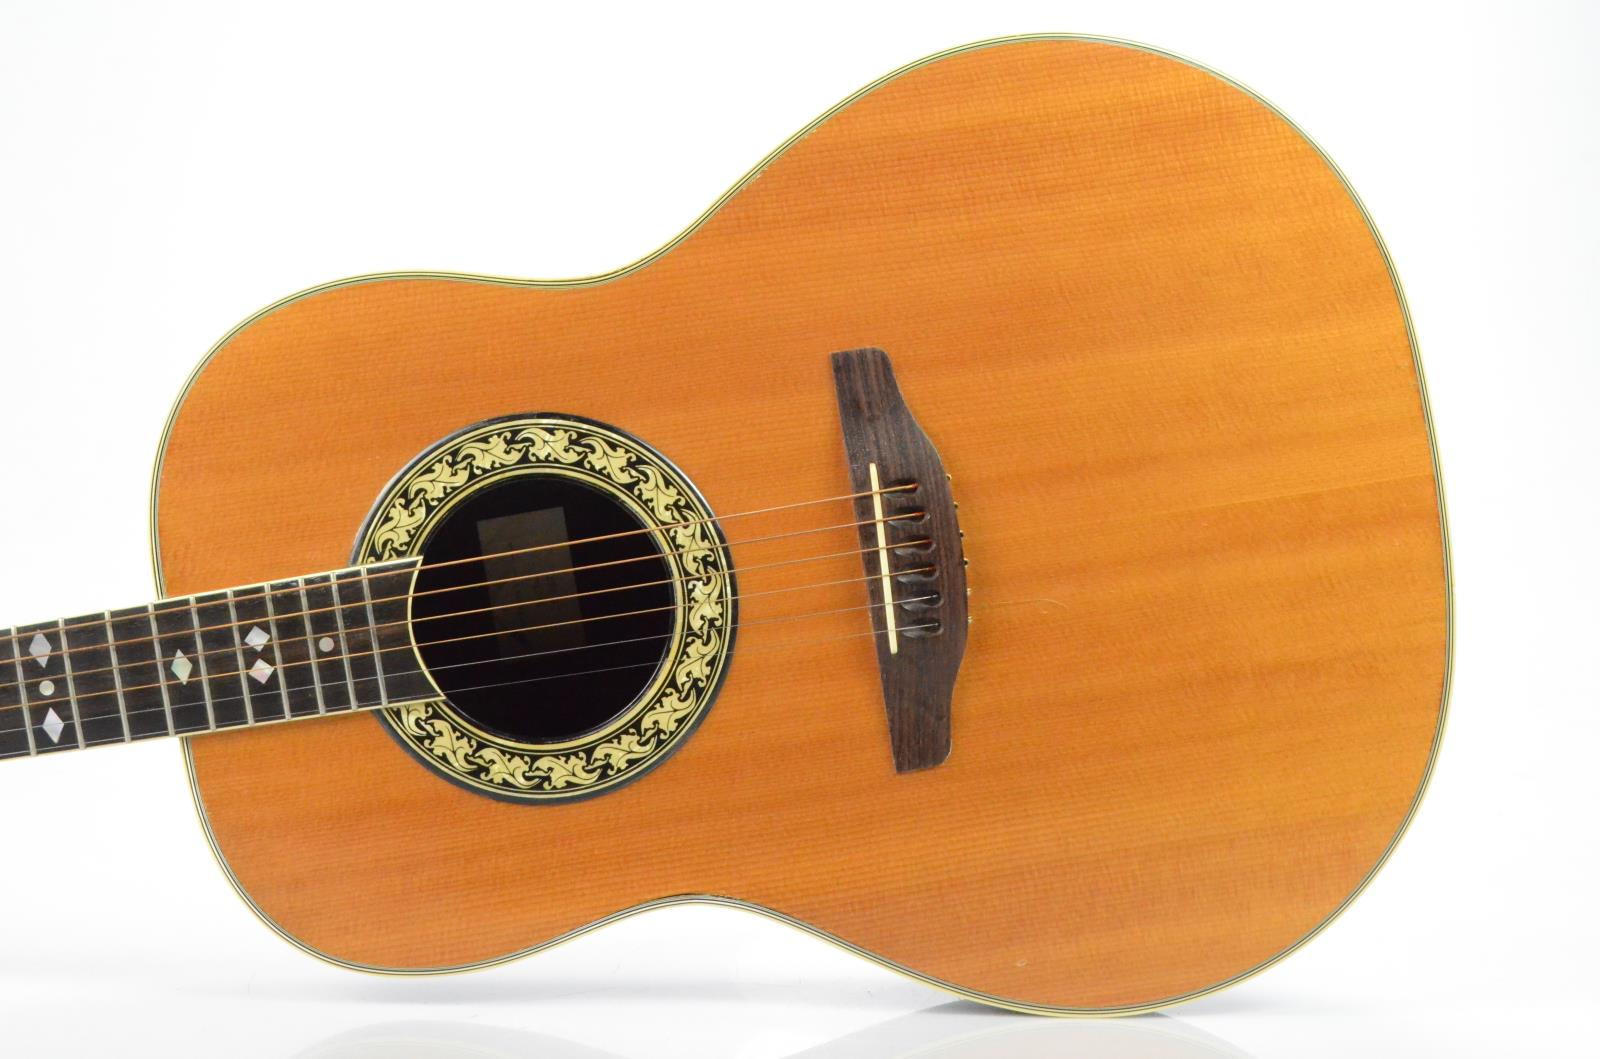 Ovation 1127-4 Glen Campbell Acoustic Guitar Left-Hand Lefty Carlos Rios #33984